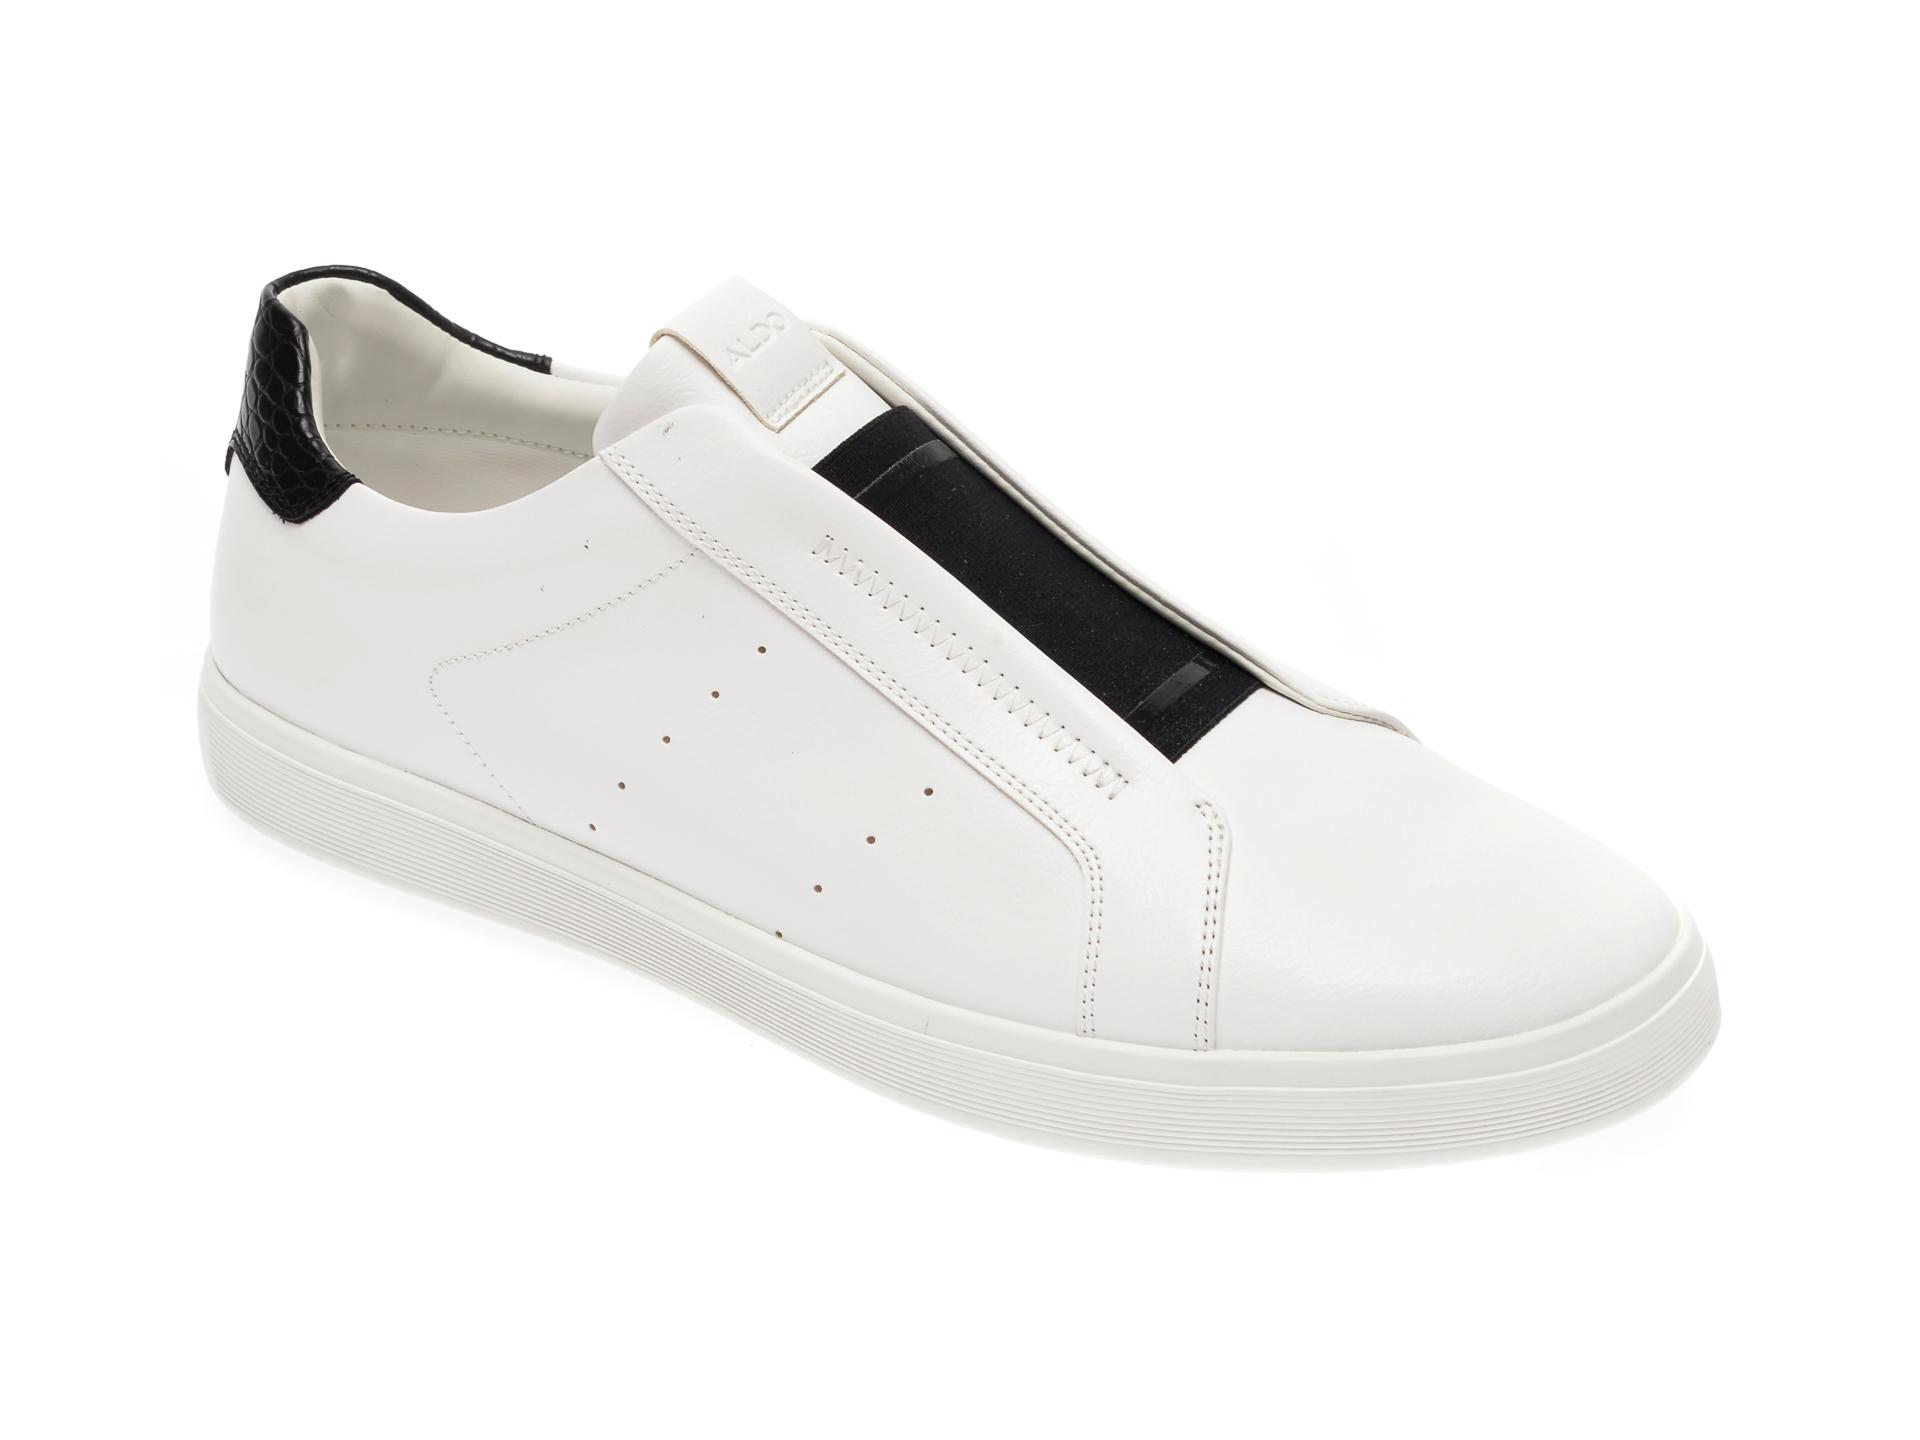 Pantofi Aldo Albi, Boomerang100, Din Piele Ecologica